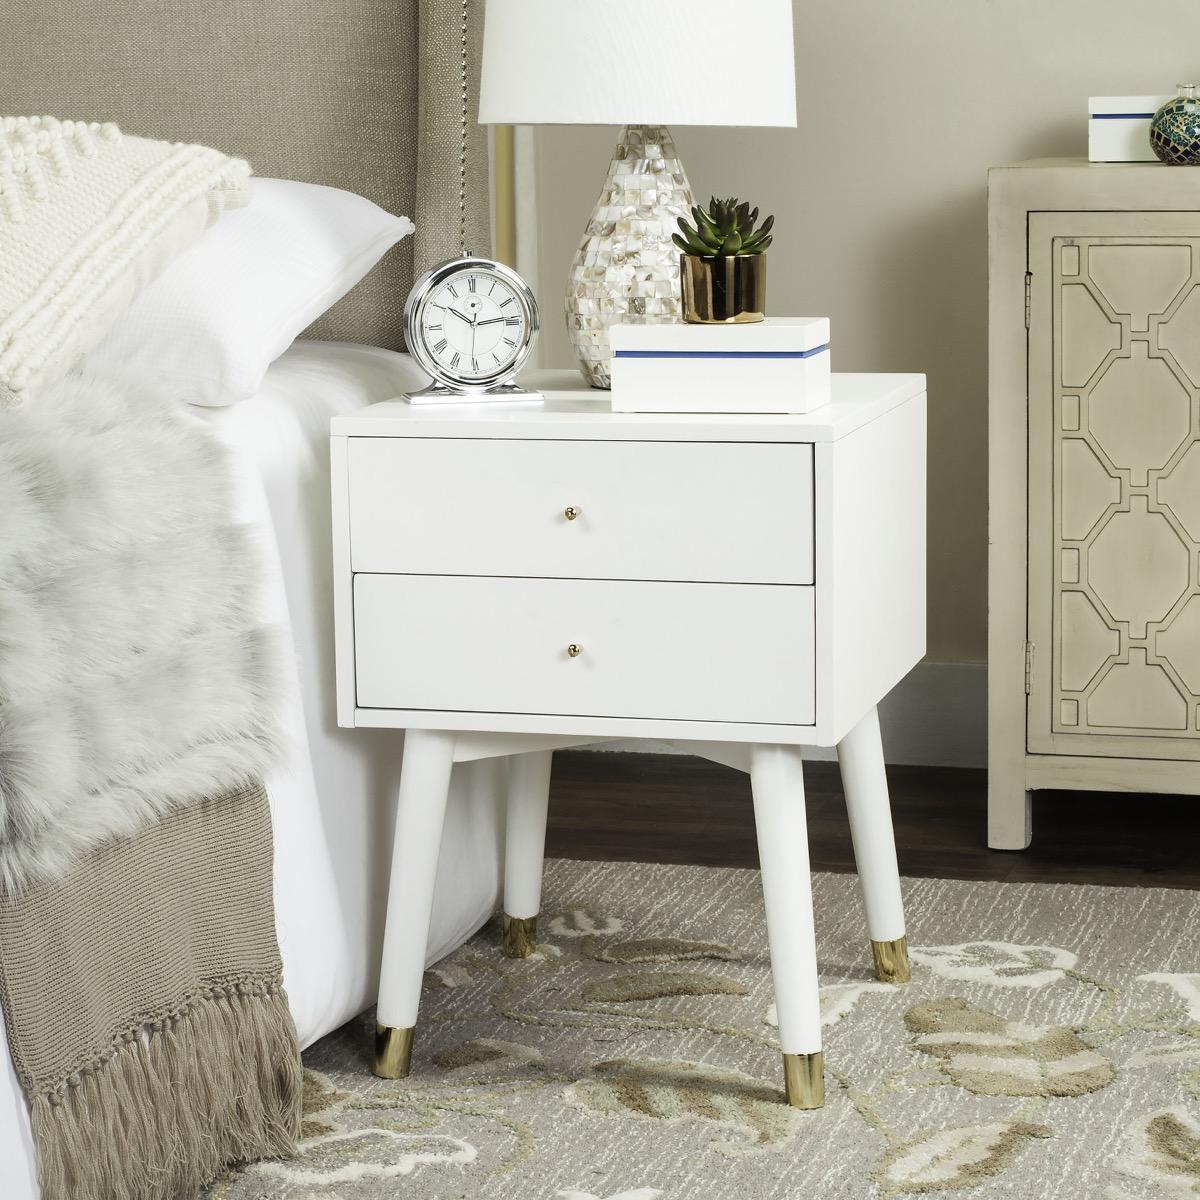 Log Bed Bedroom Ideas Bedroom Carpet Uk Vintage Bedroom Art White Bedroom Chairs: FOX6234B Accent Tables, Nightstands